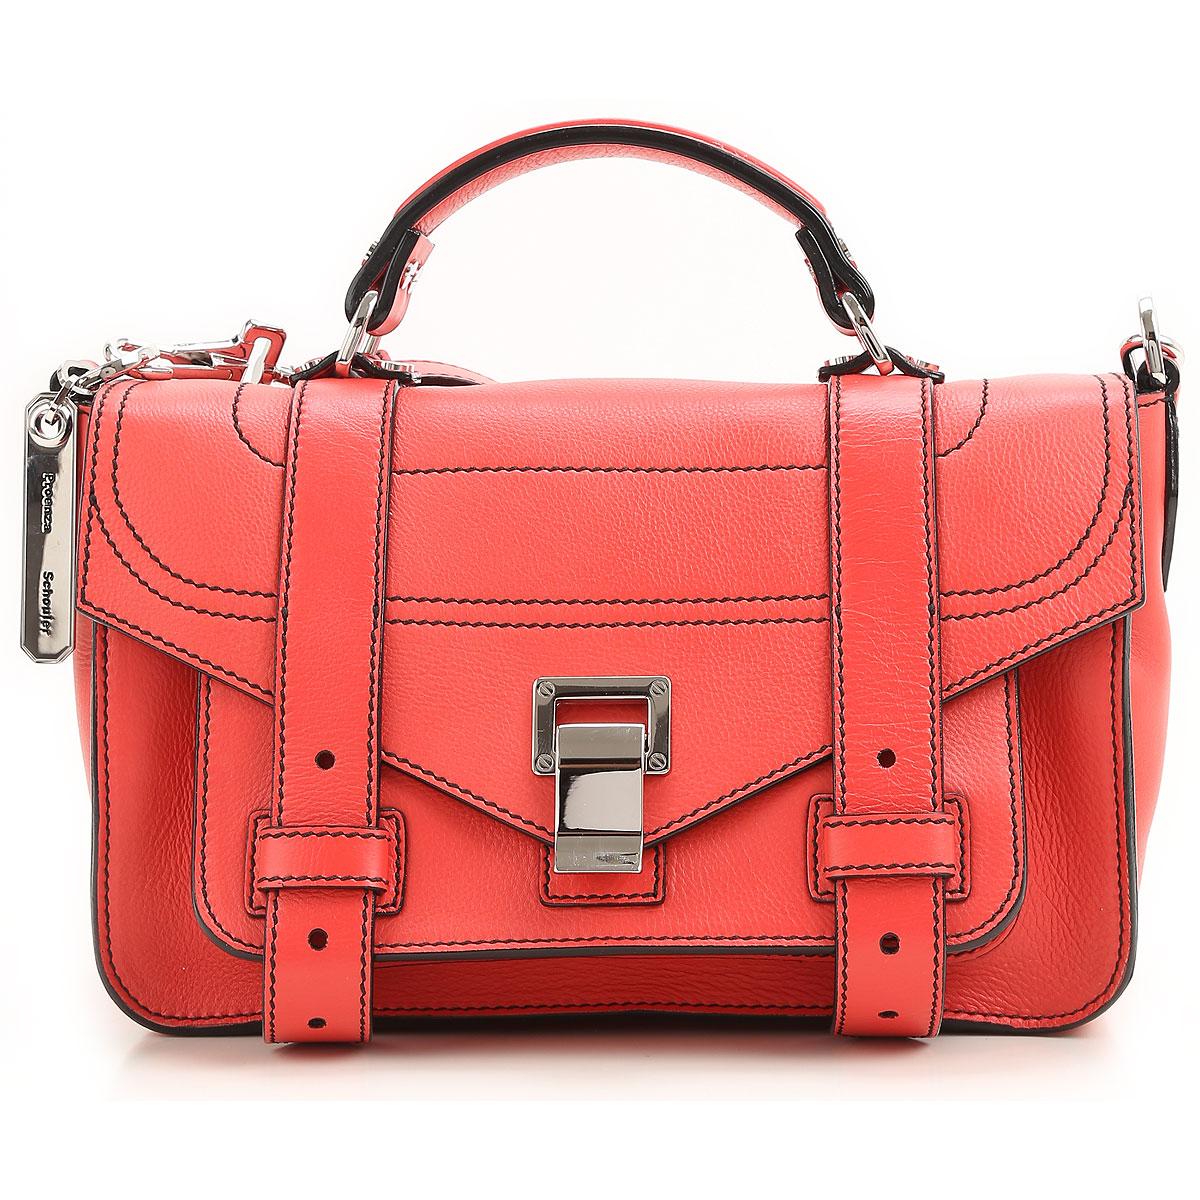 Image of Proenza Schouler Messenger Bag for Women On Sale, Geranium, Leather, 2017